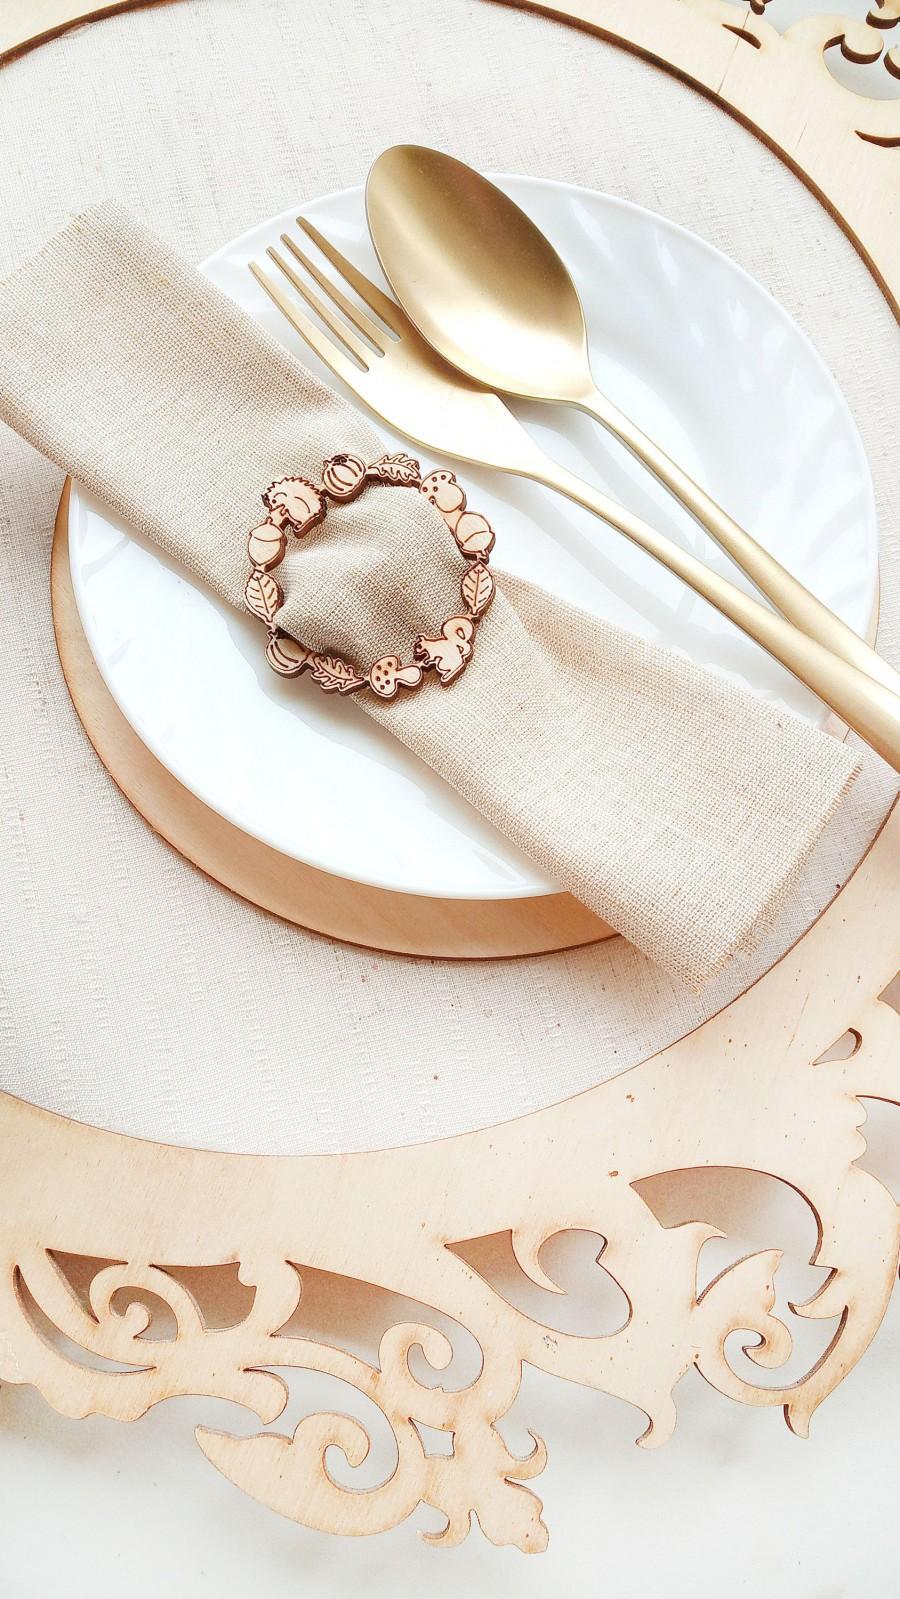 Hochzeit - Wooden napkin ring rustic and forest wedding decor